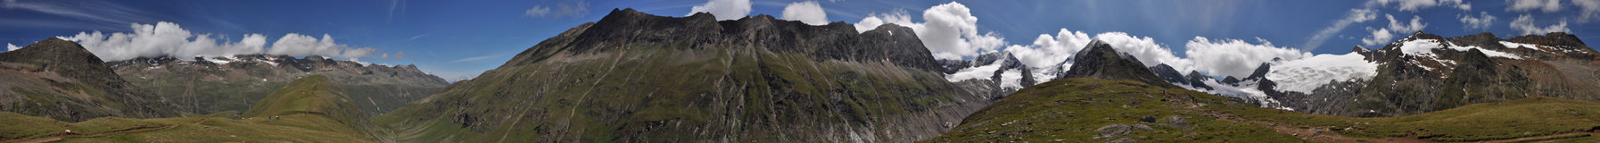 360 Grad Panorama Stockbild